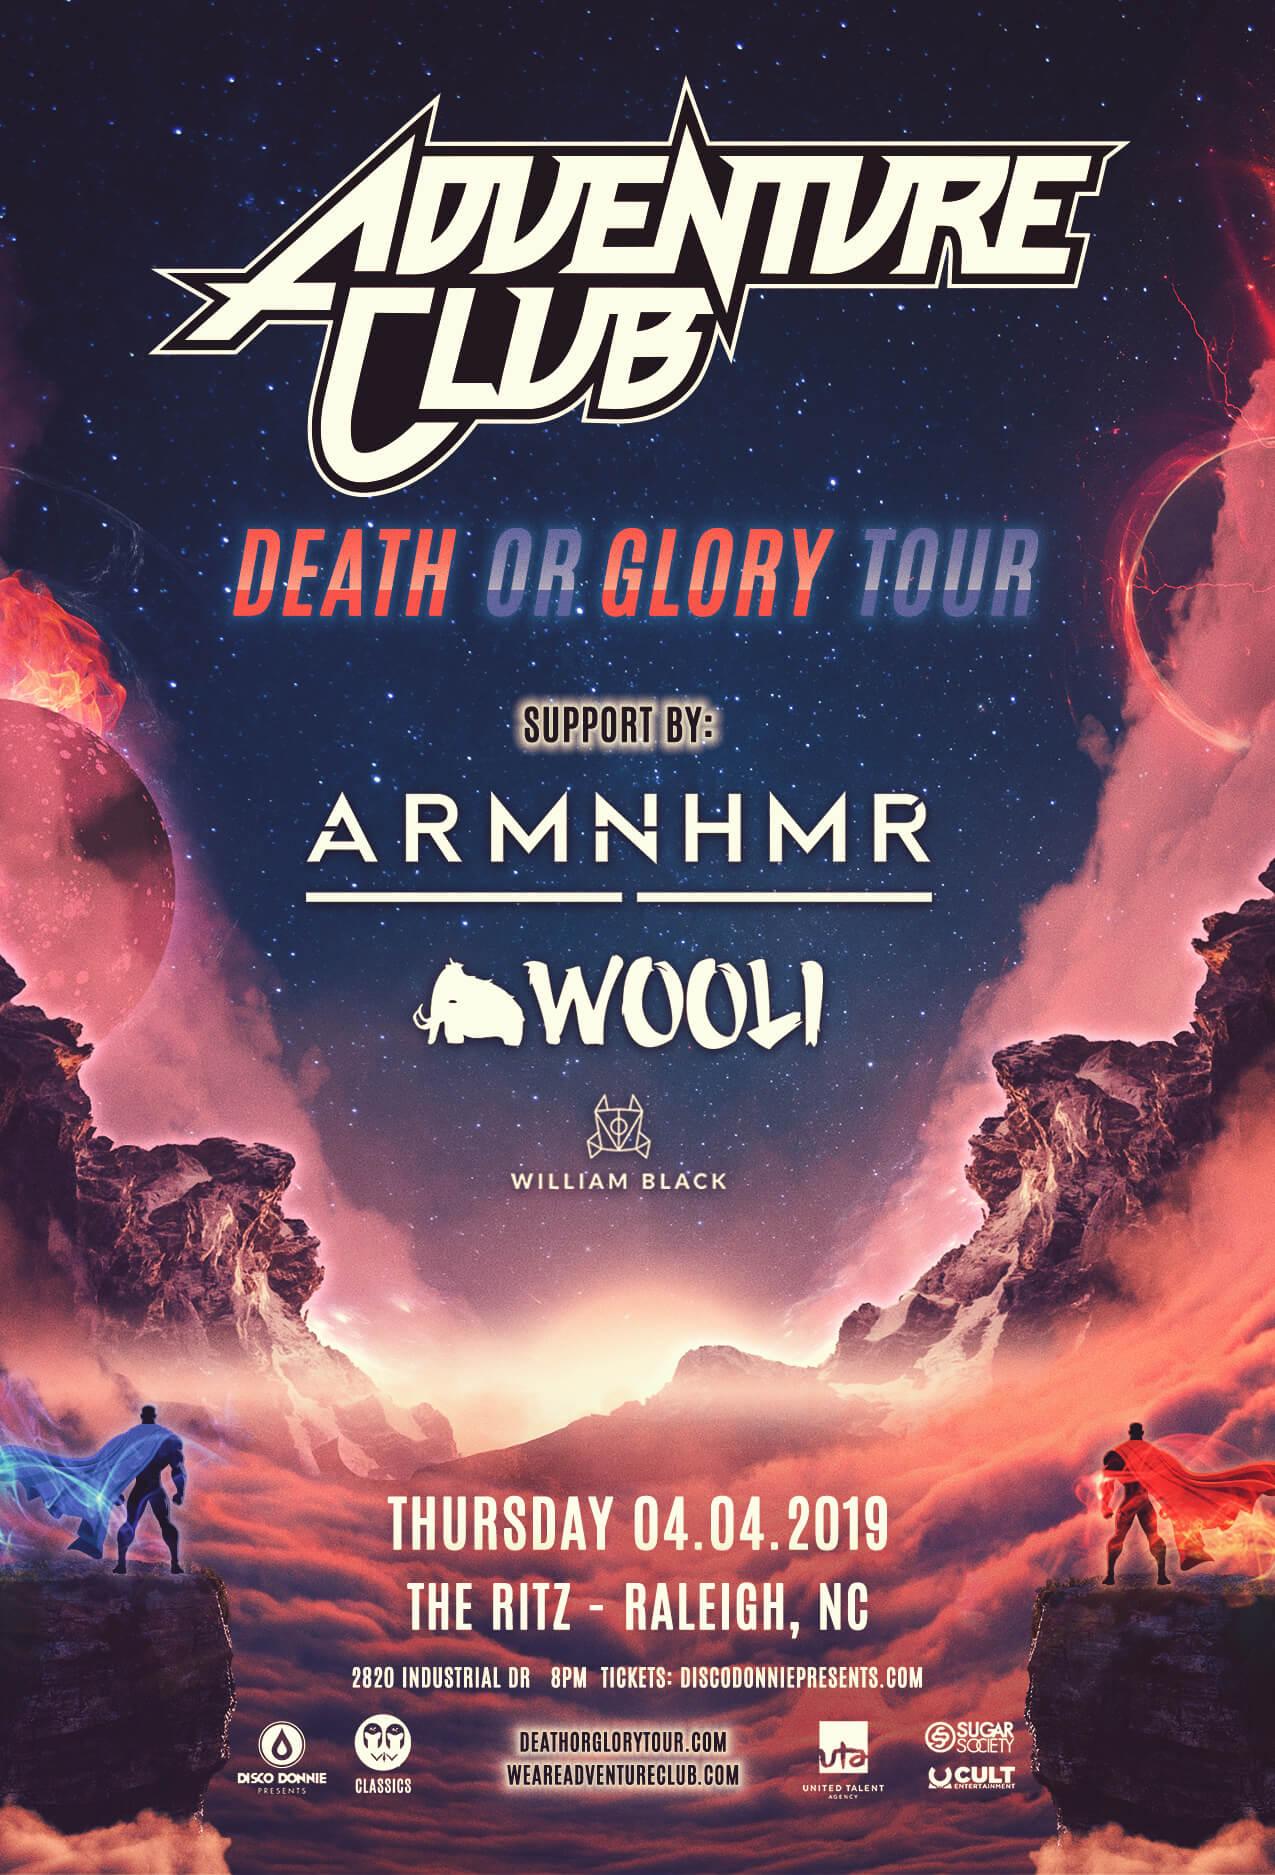 Adventure Club, ARMNHMR, Wooli, William Black in Raleigh